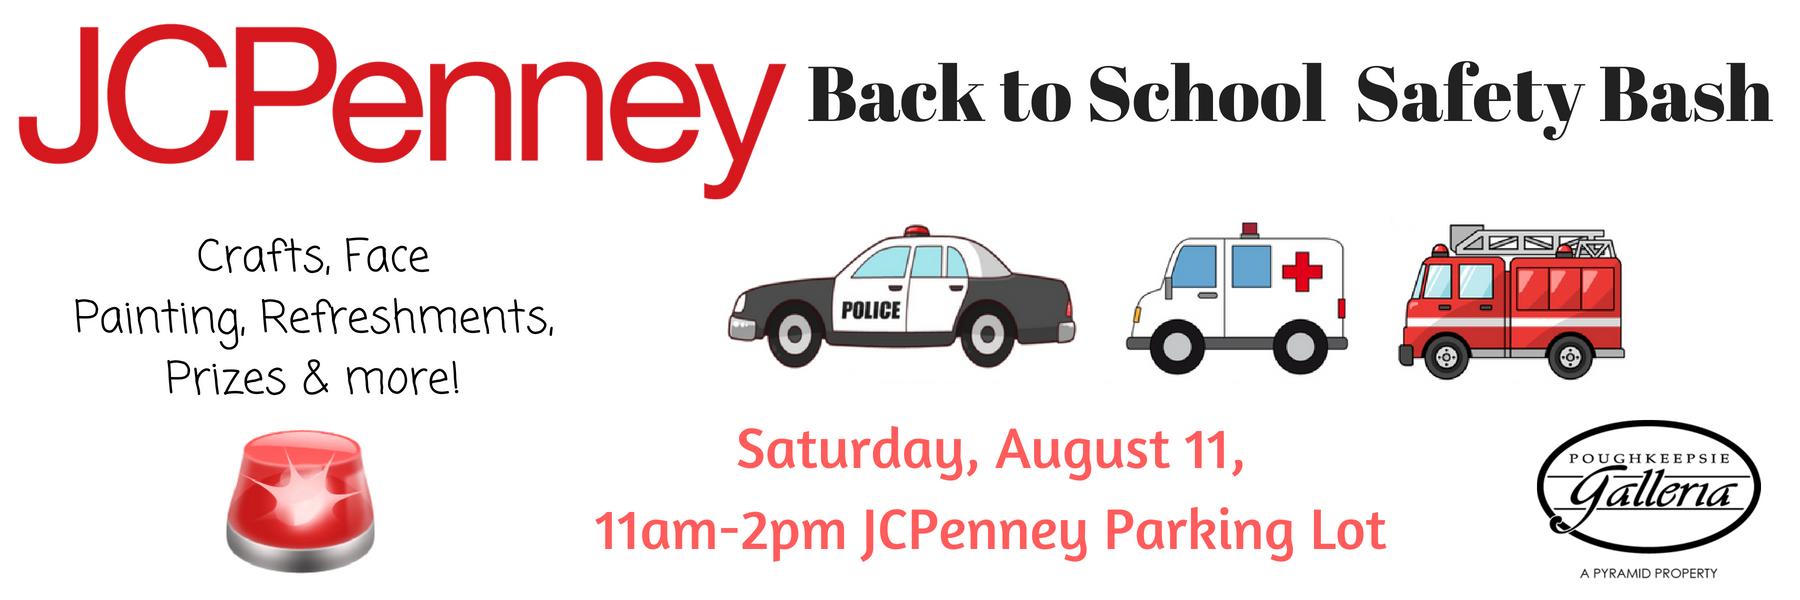 JC Penney - Back to School Bash - website